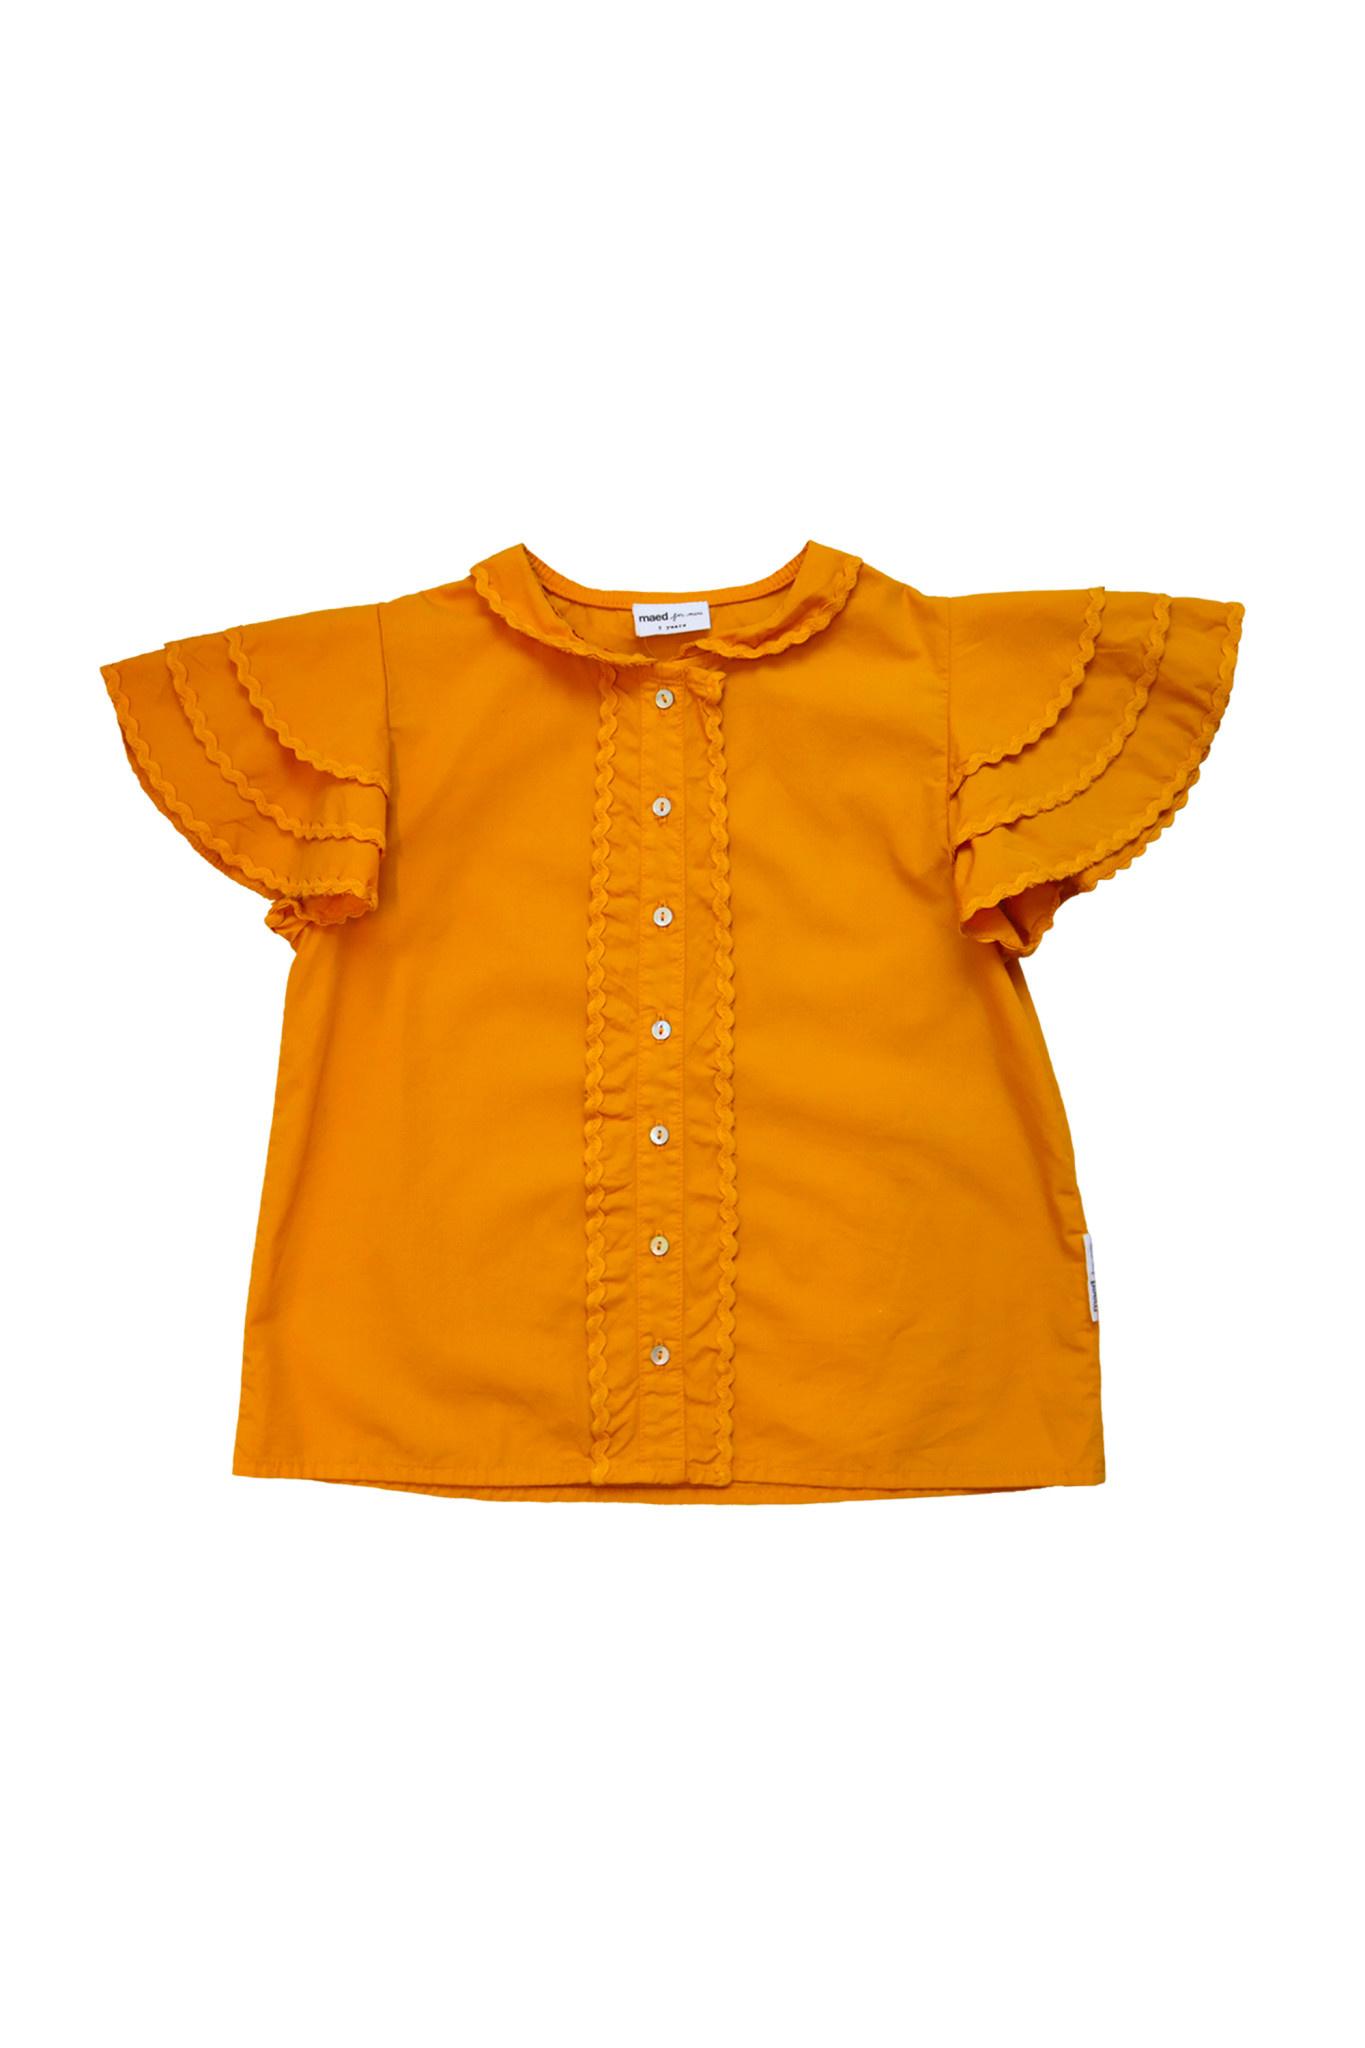 Legal liger blouse baby-1